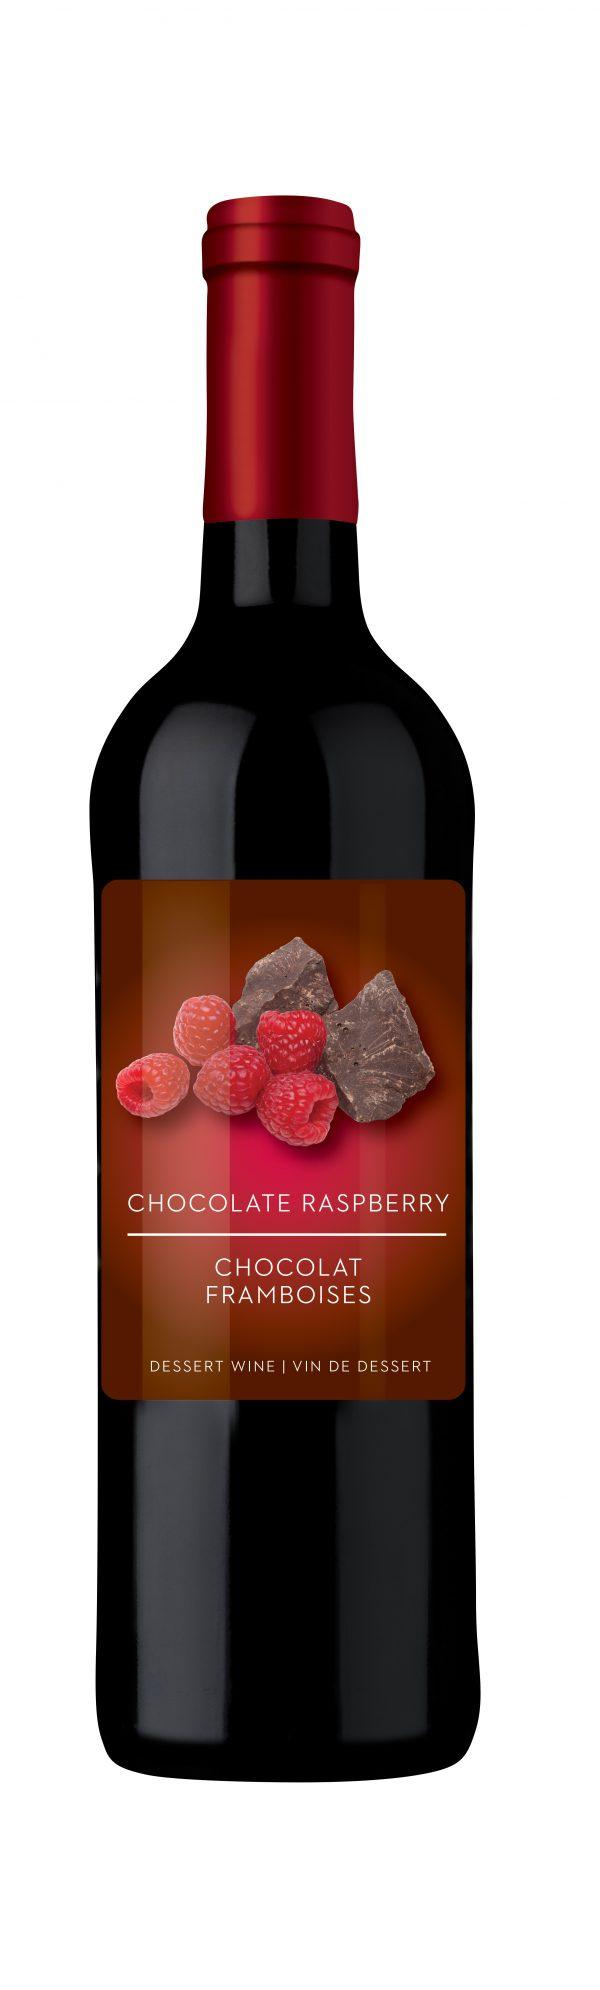 Winexpert Apres Chocolate Raspberry Dessert Wine-0